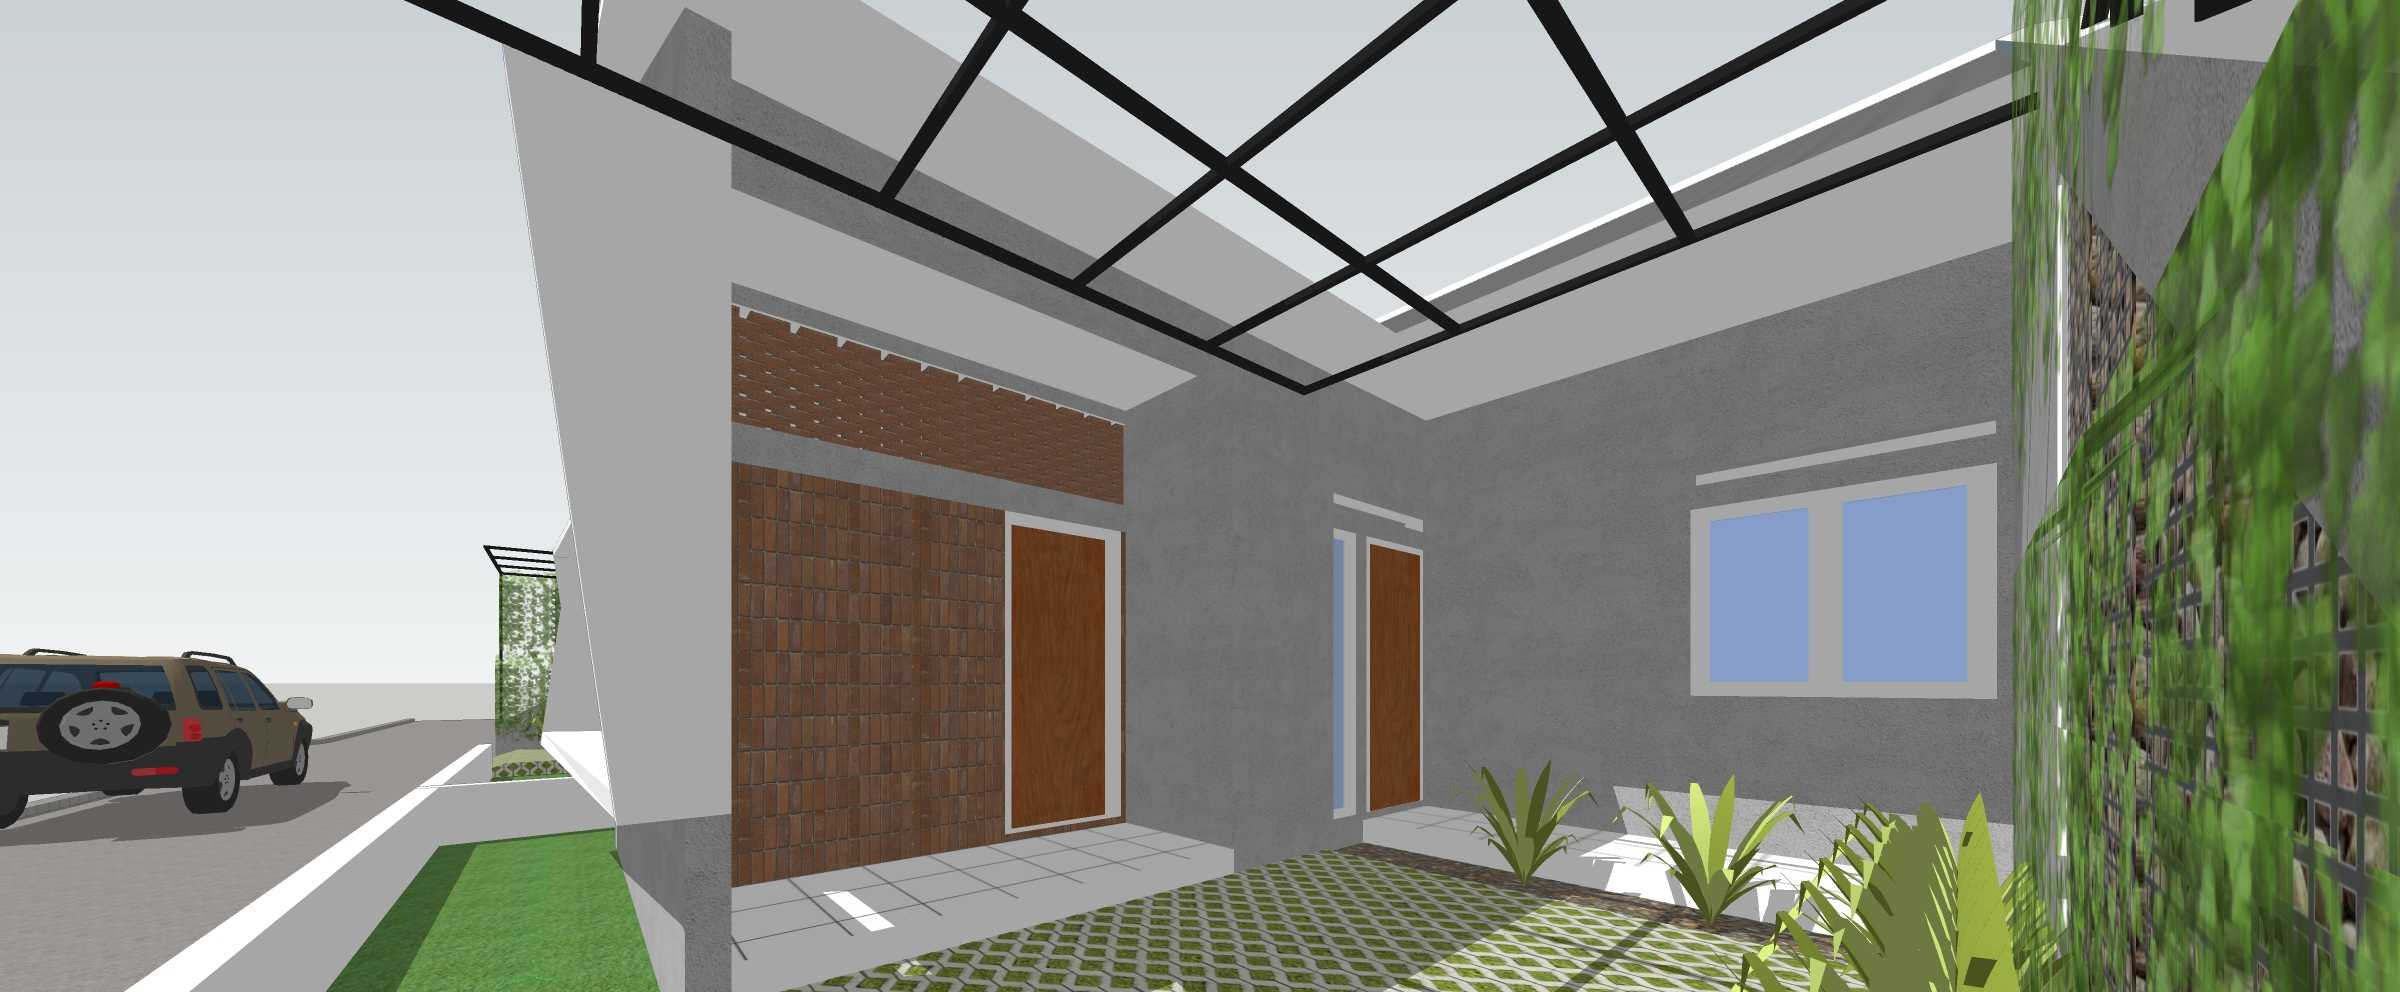 Studio Mifanolu Tj Couple House Kabupaten Deli Serdang, Sumatera Utara, Indonesia Kabupaten Deli Serdang, Sumatera Utara, Indonesia Garage Tropical,tropis  39680